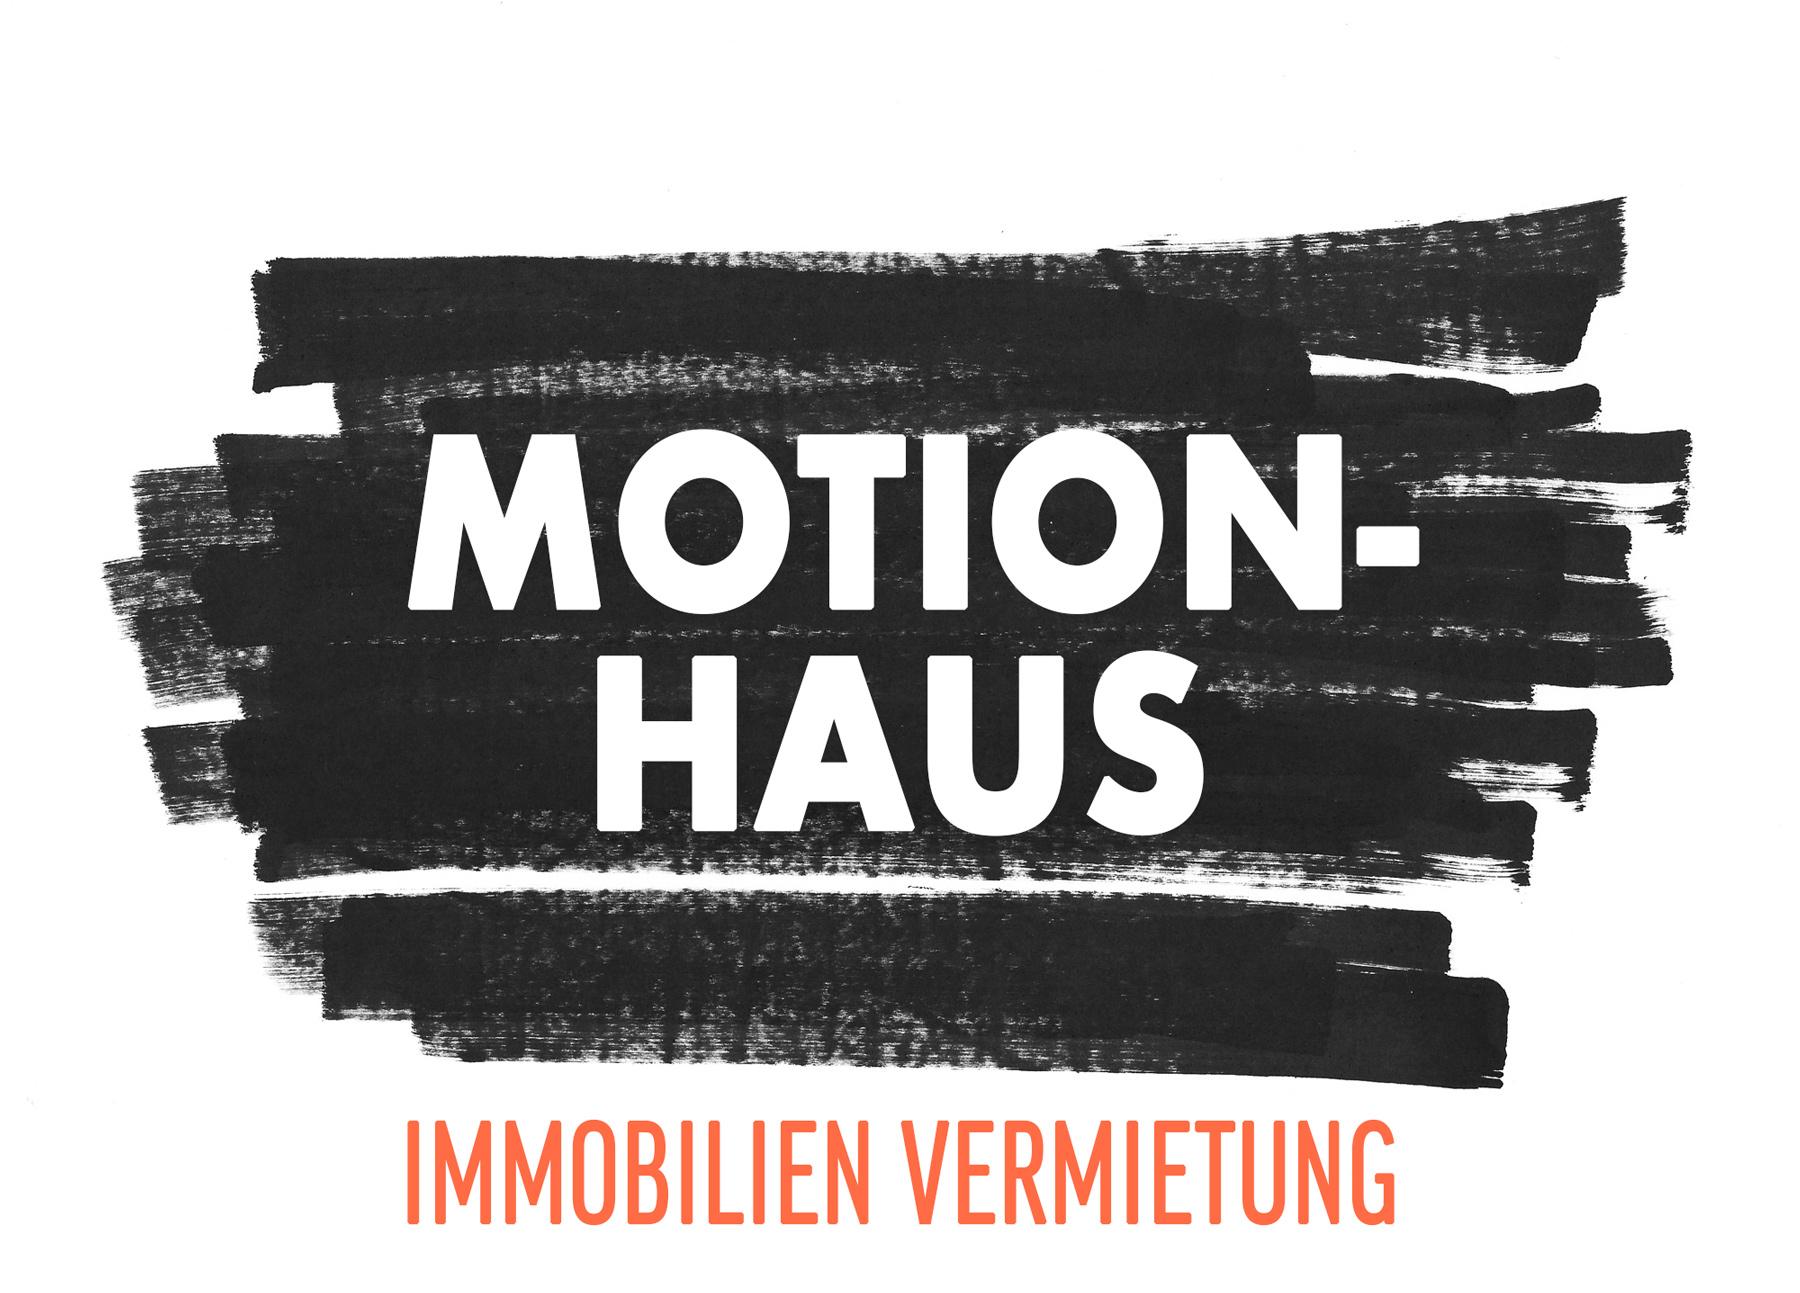 motionhaus.jpg